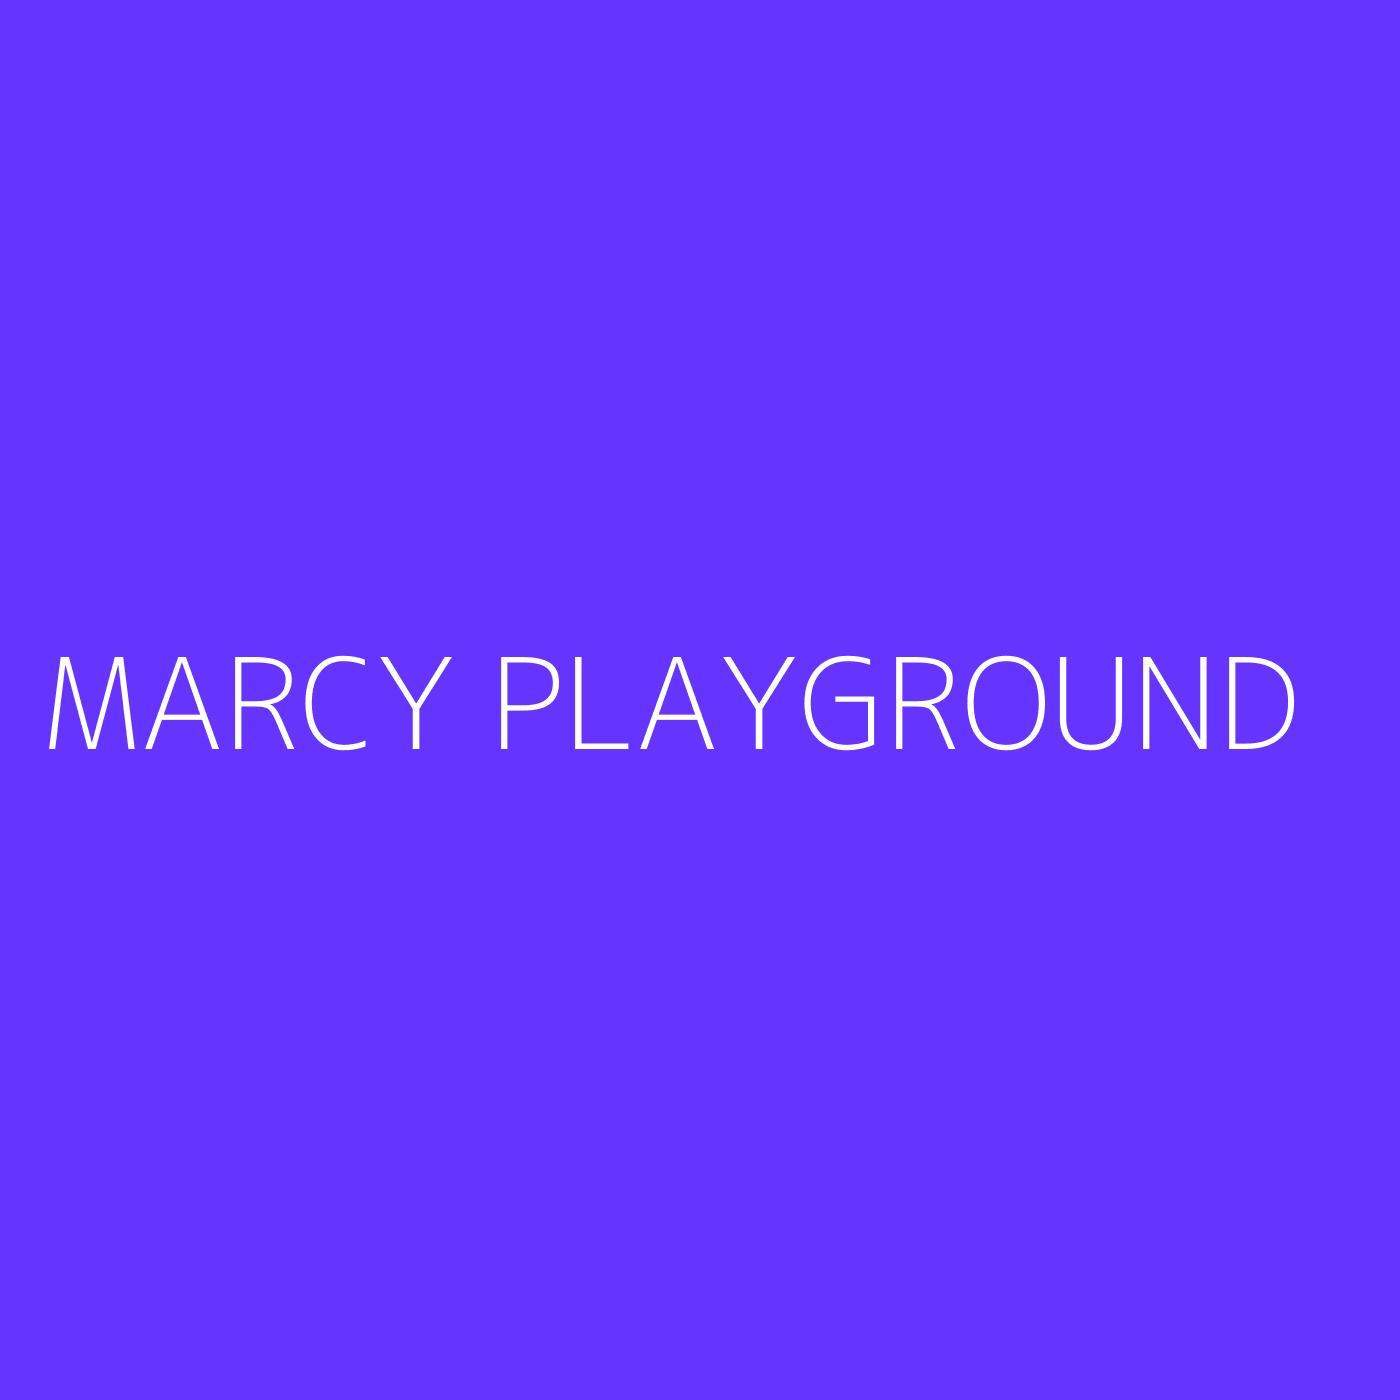 Marcy Playground Playlist Artwork